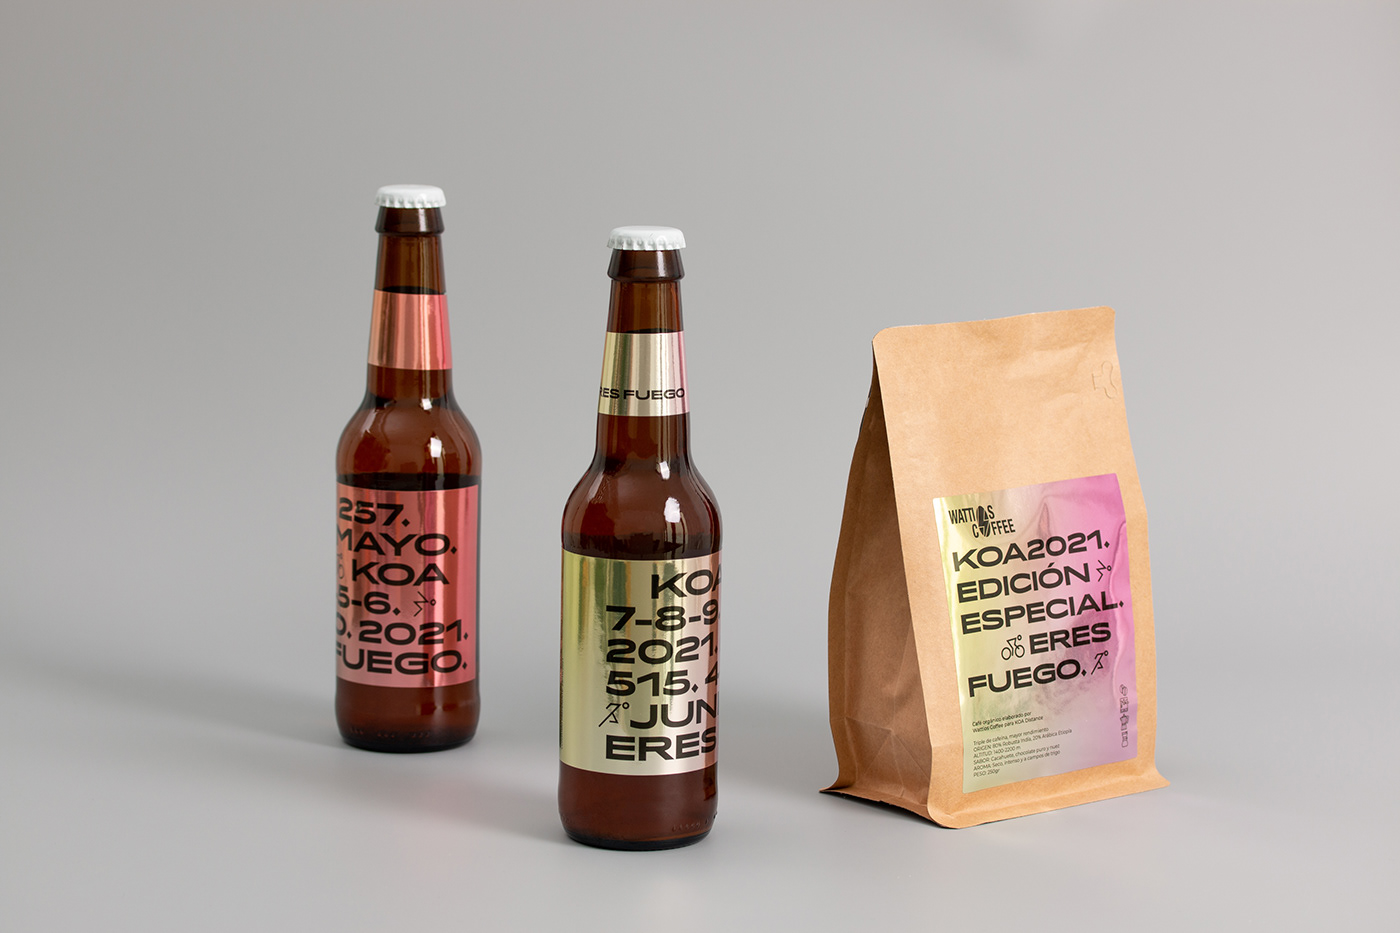 beer cafe cerveza Coffee etiqueta labeling Packaging sports Triathlon wear